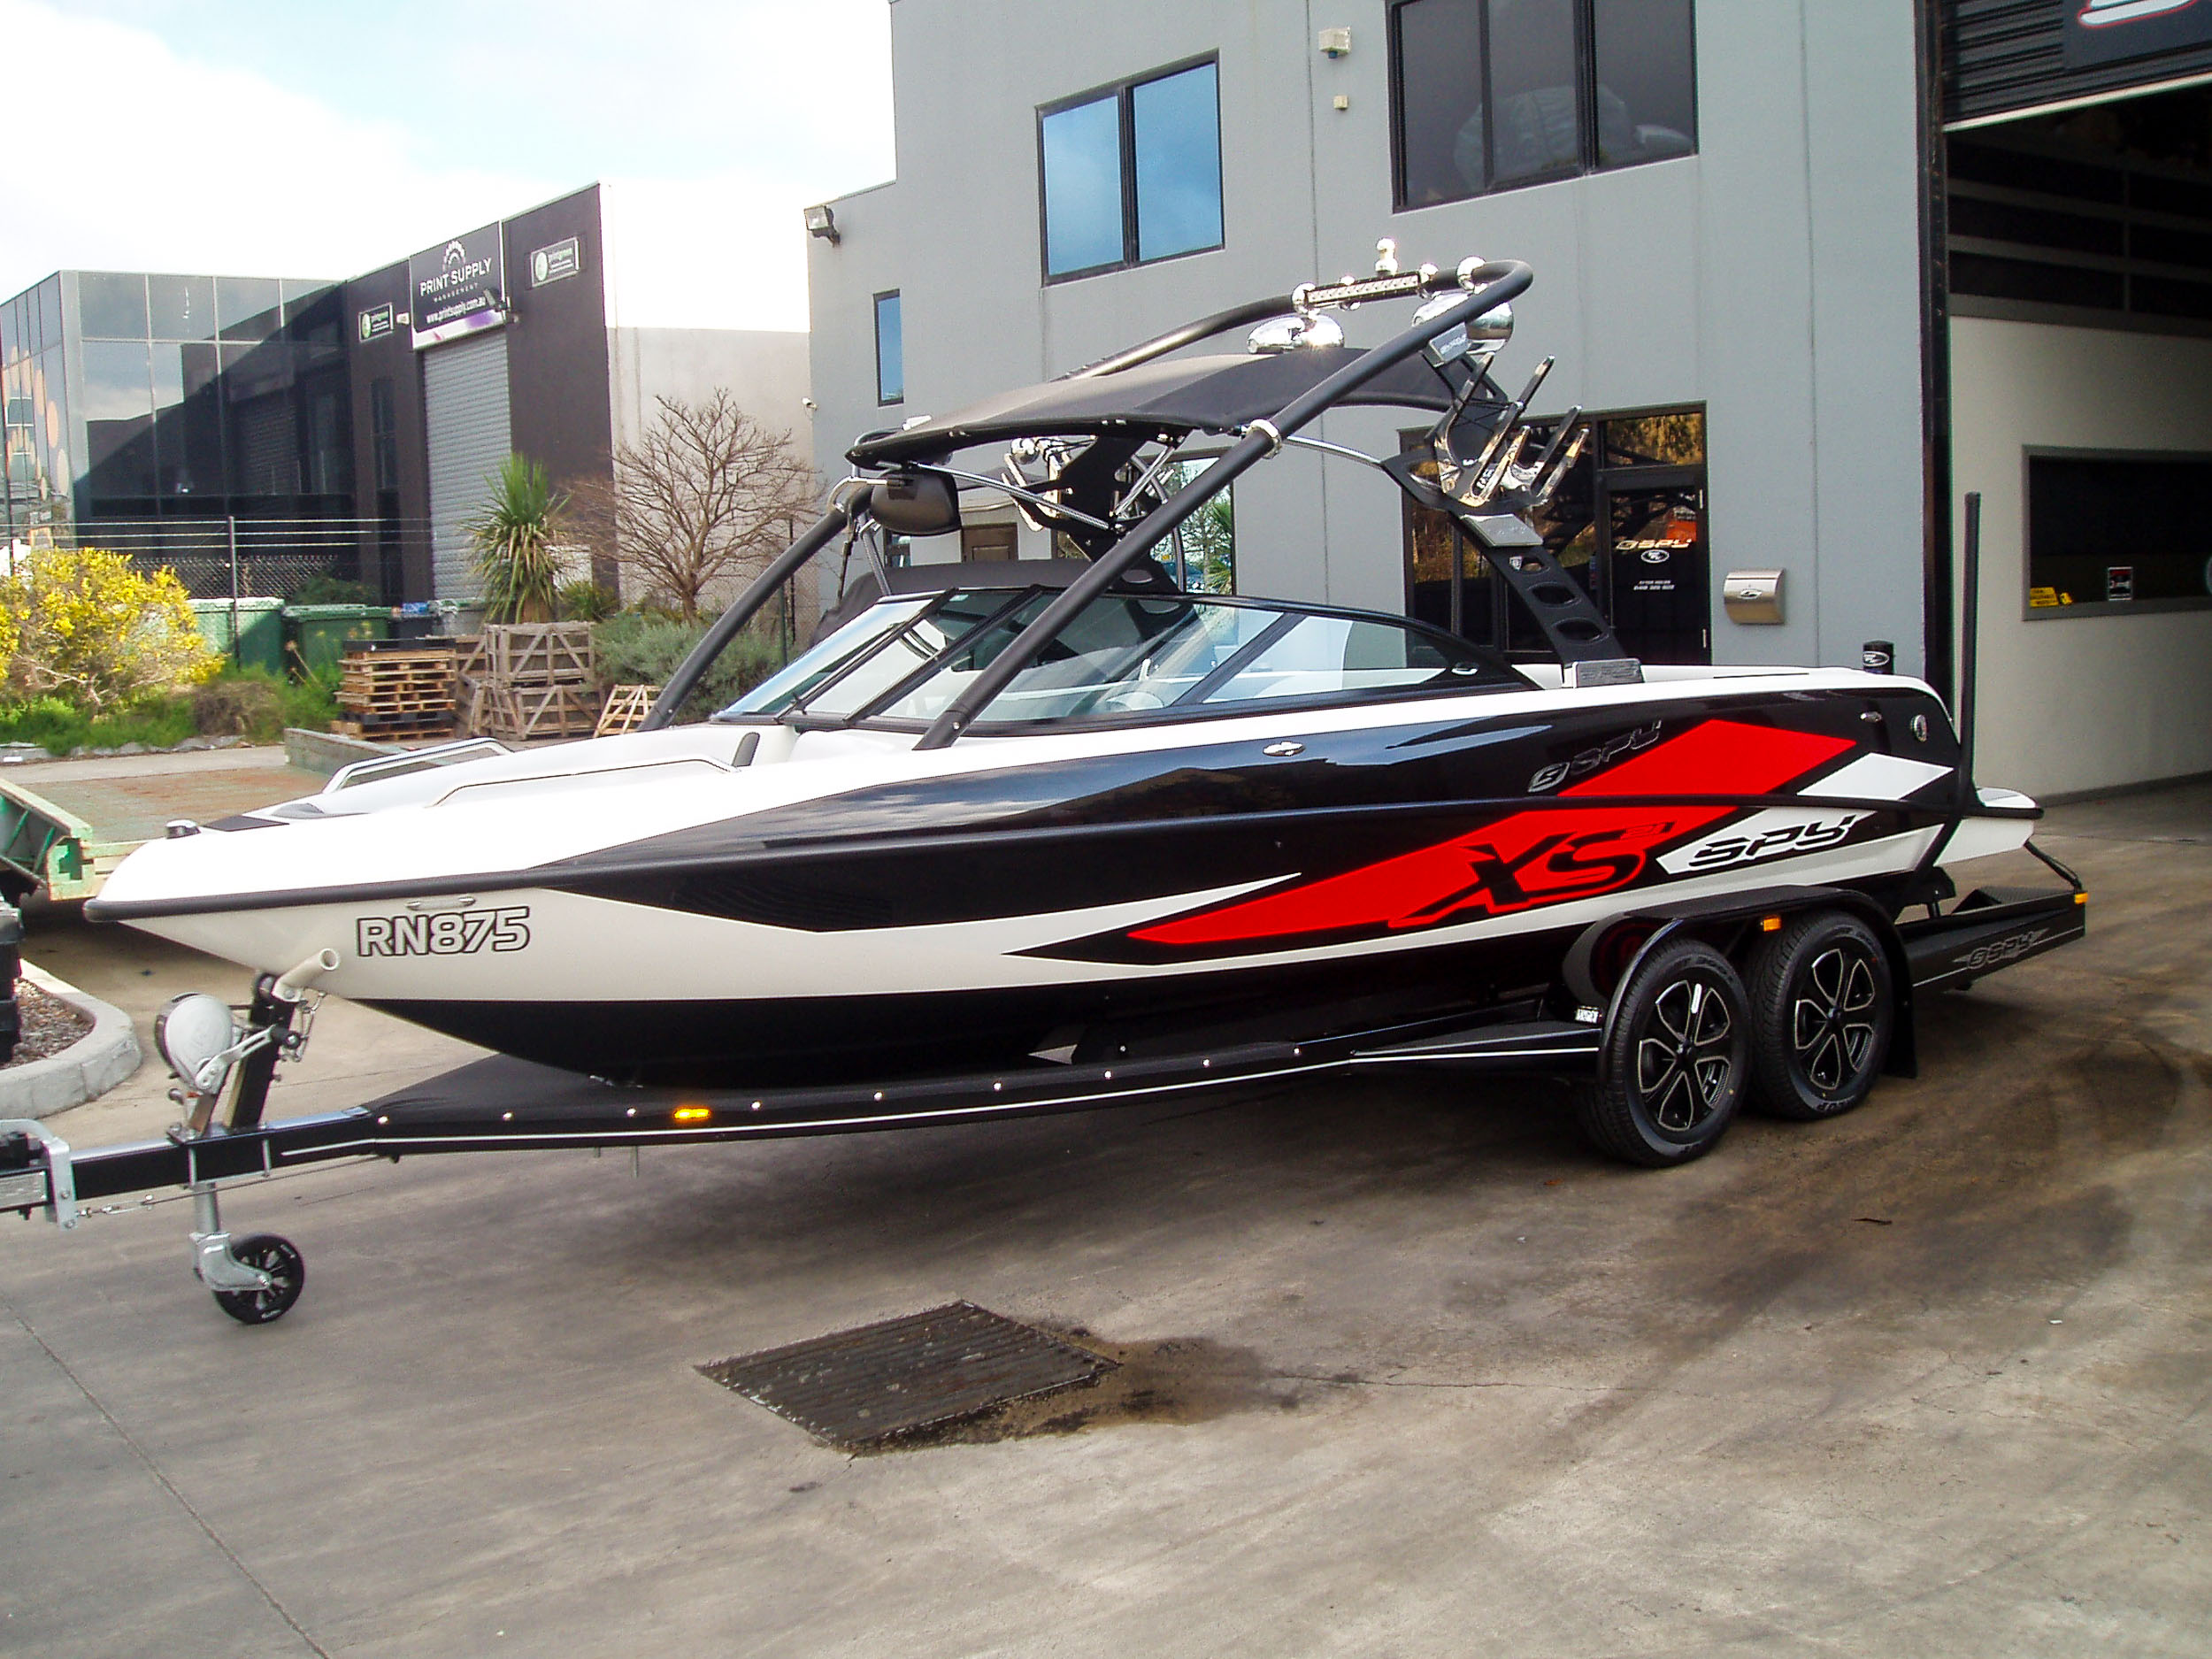 Spy_Boats_XS21-7.jpg